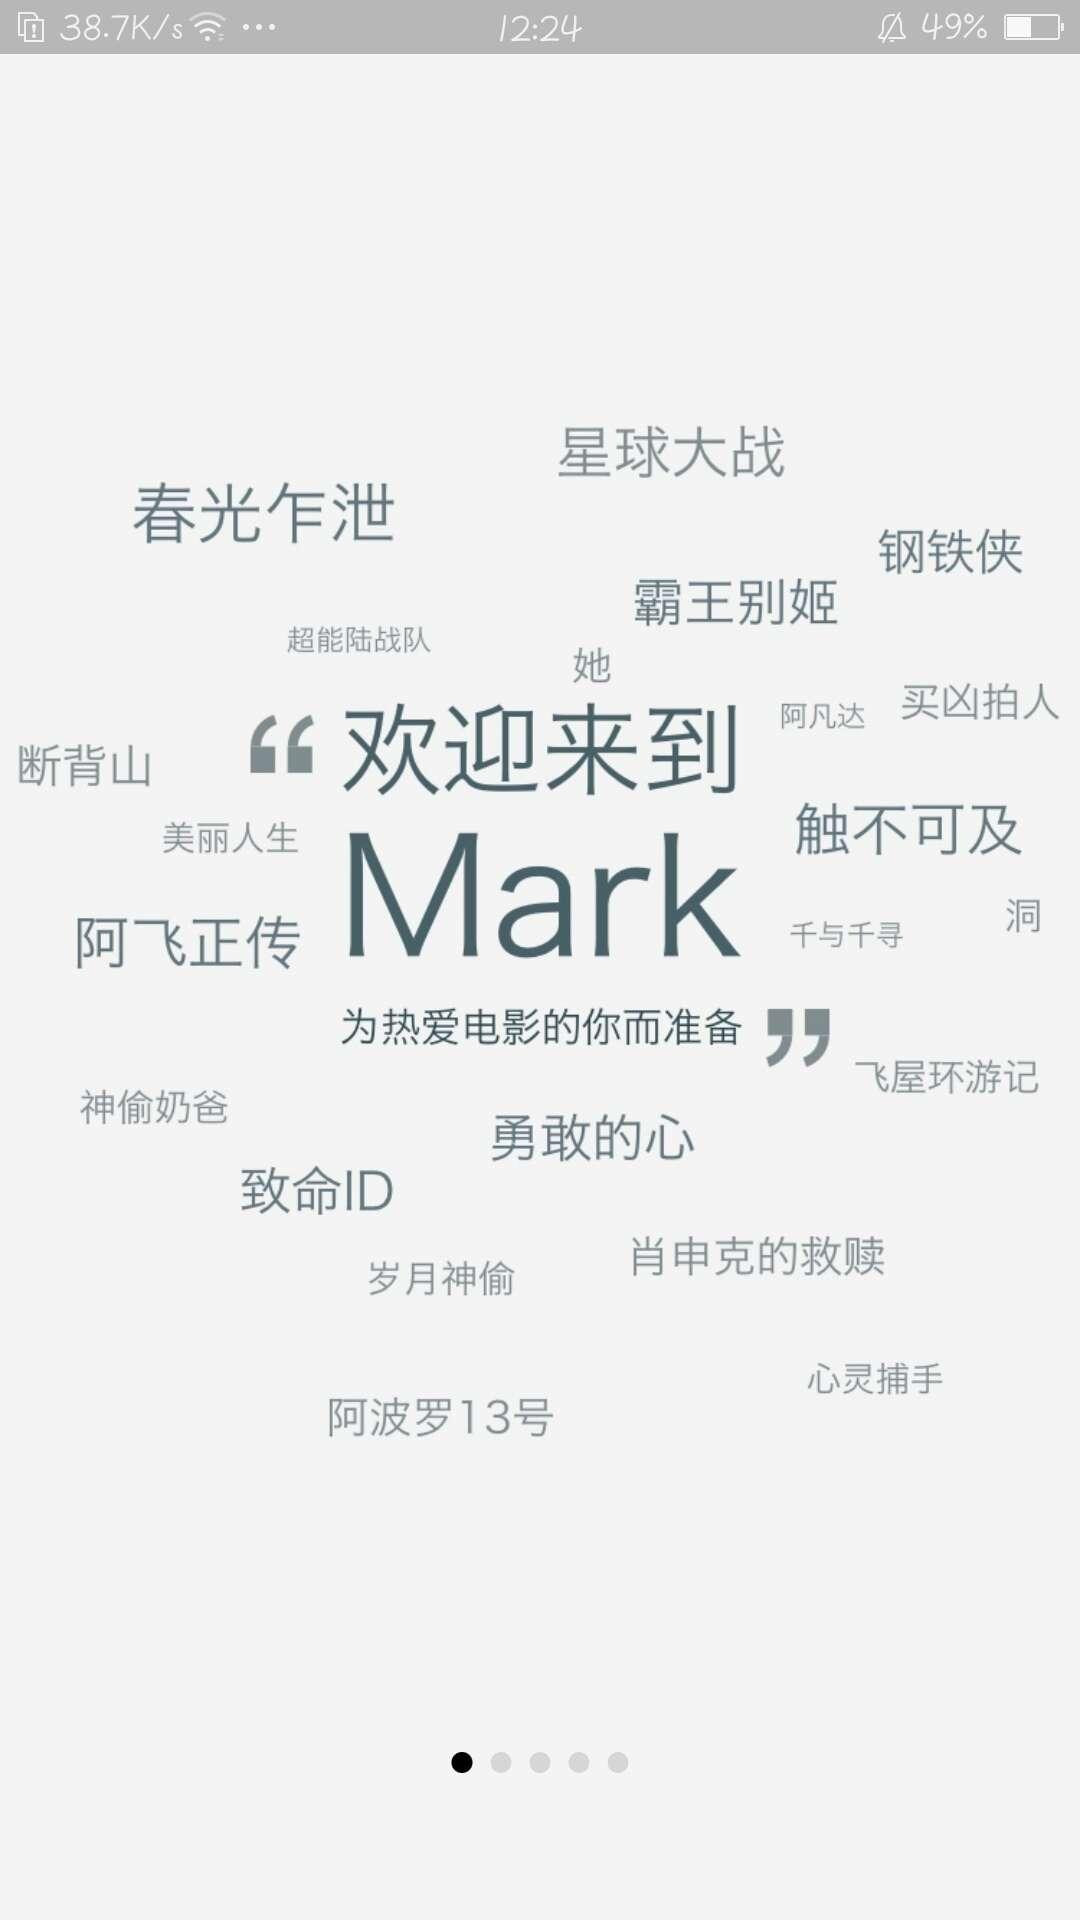 【分享】Mark 1.6.19-爱小助